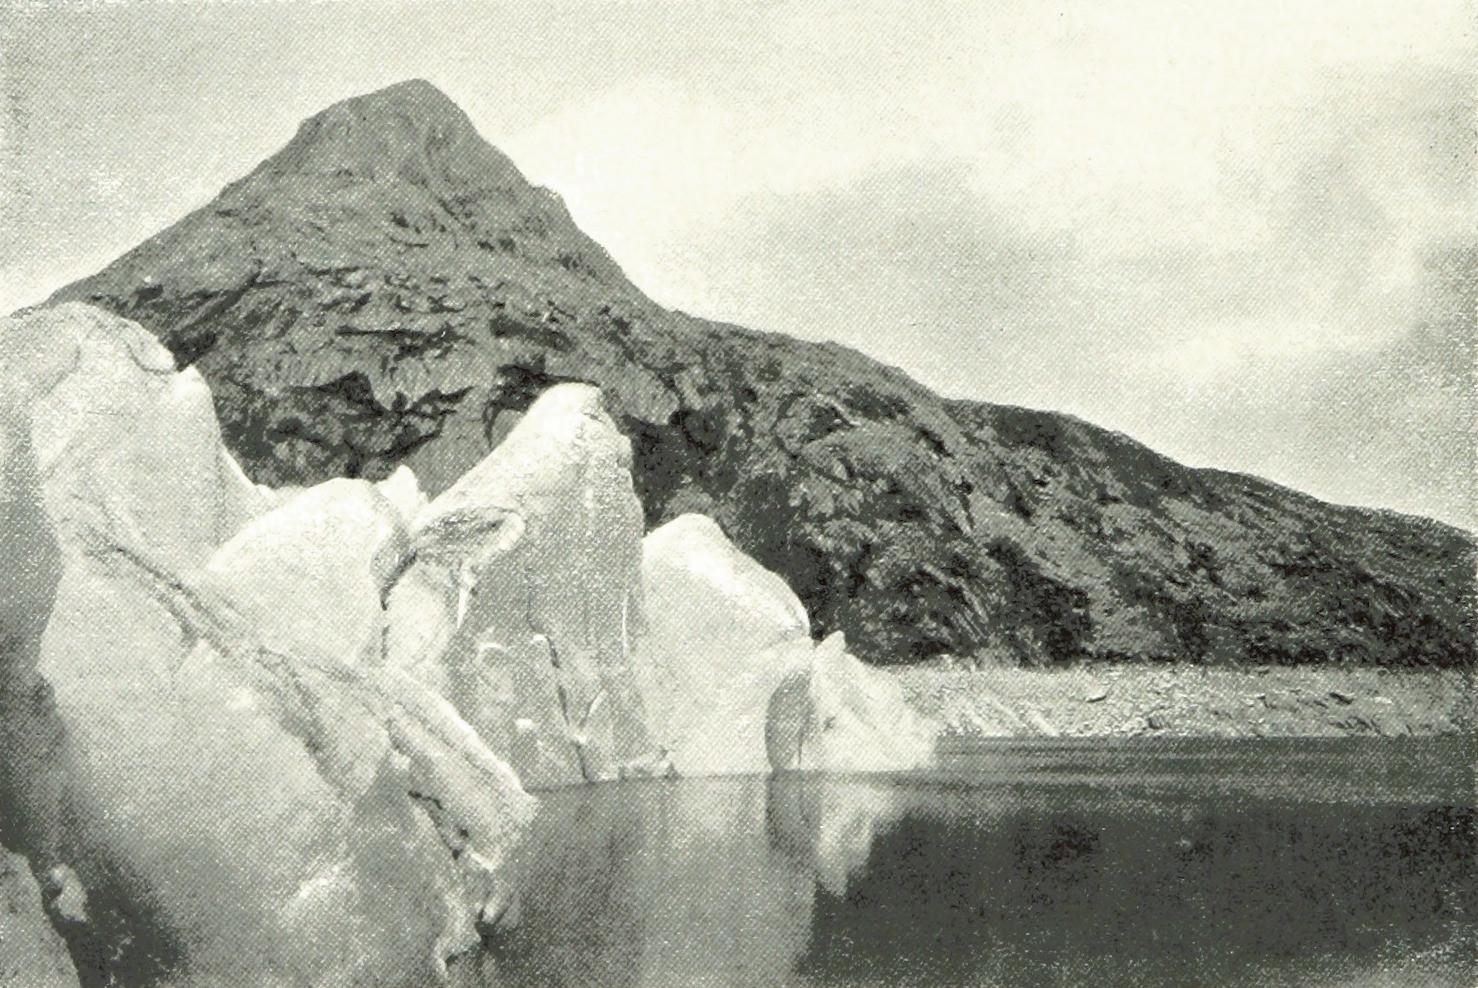 Märjelen see par Theodor Wundt, en 1898